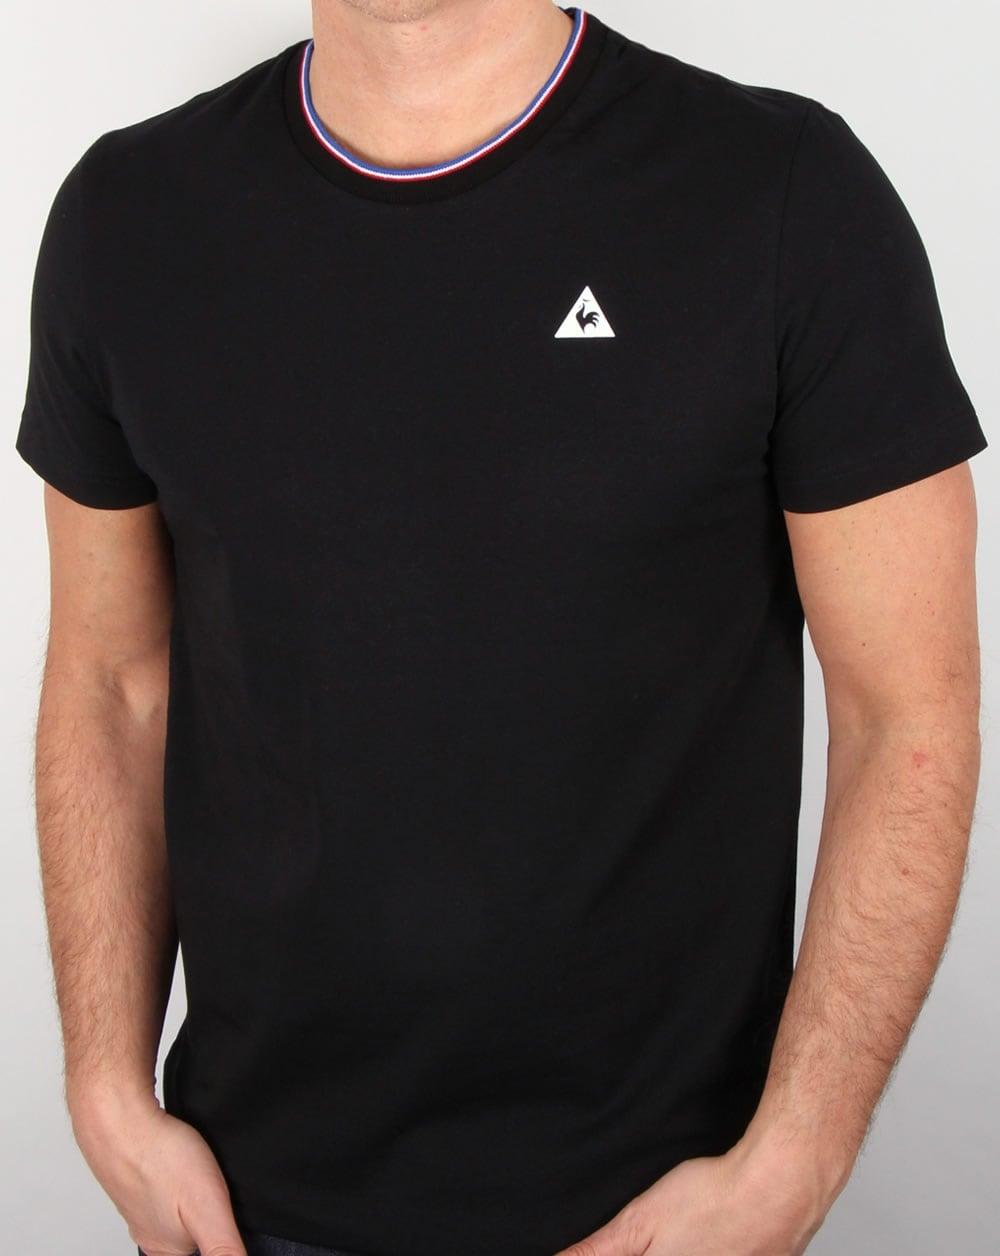 le coq sportif shirt - photo #38